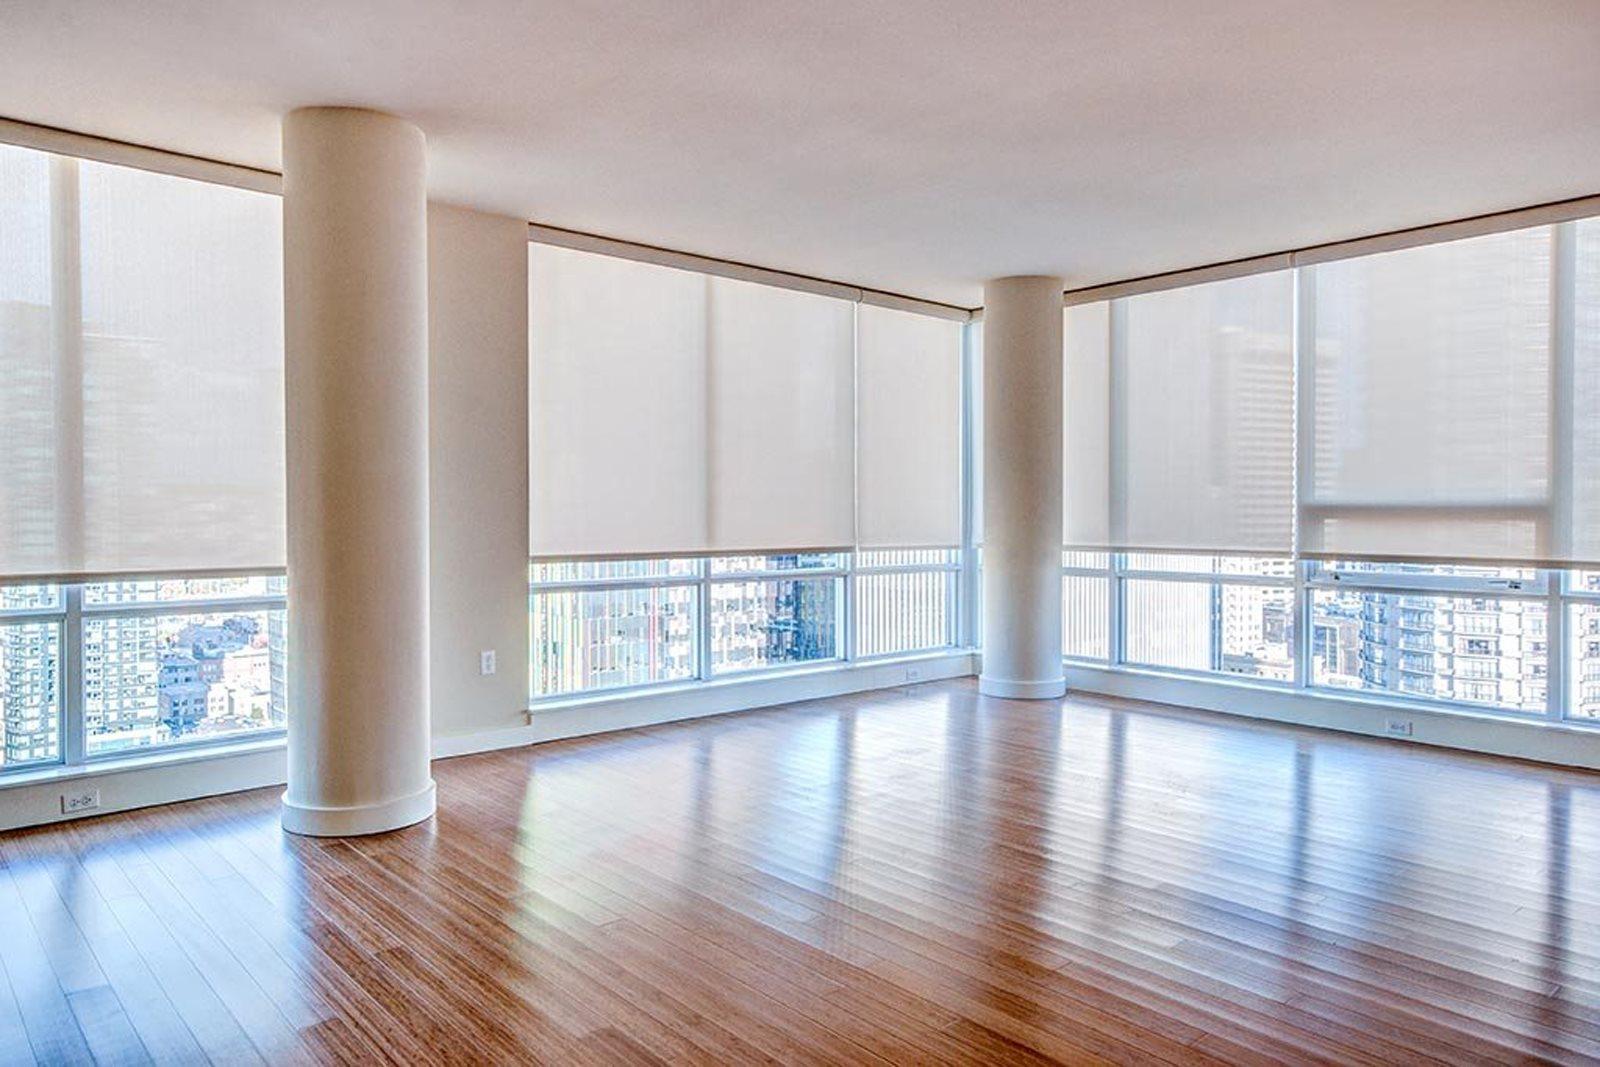 Floor to Ceiling Window at The Martin, Washington, 98121